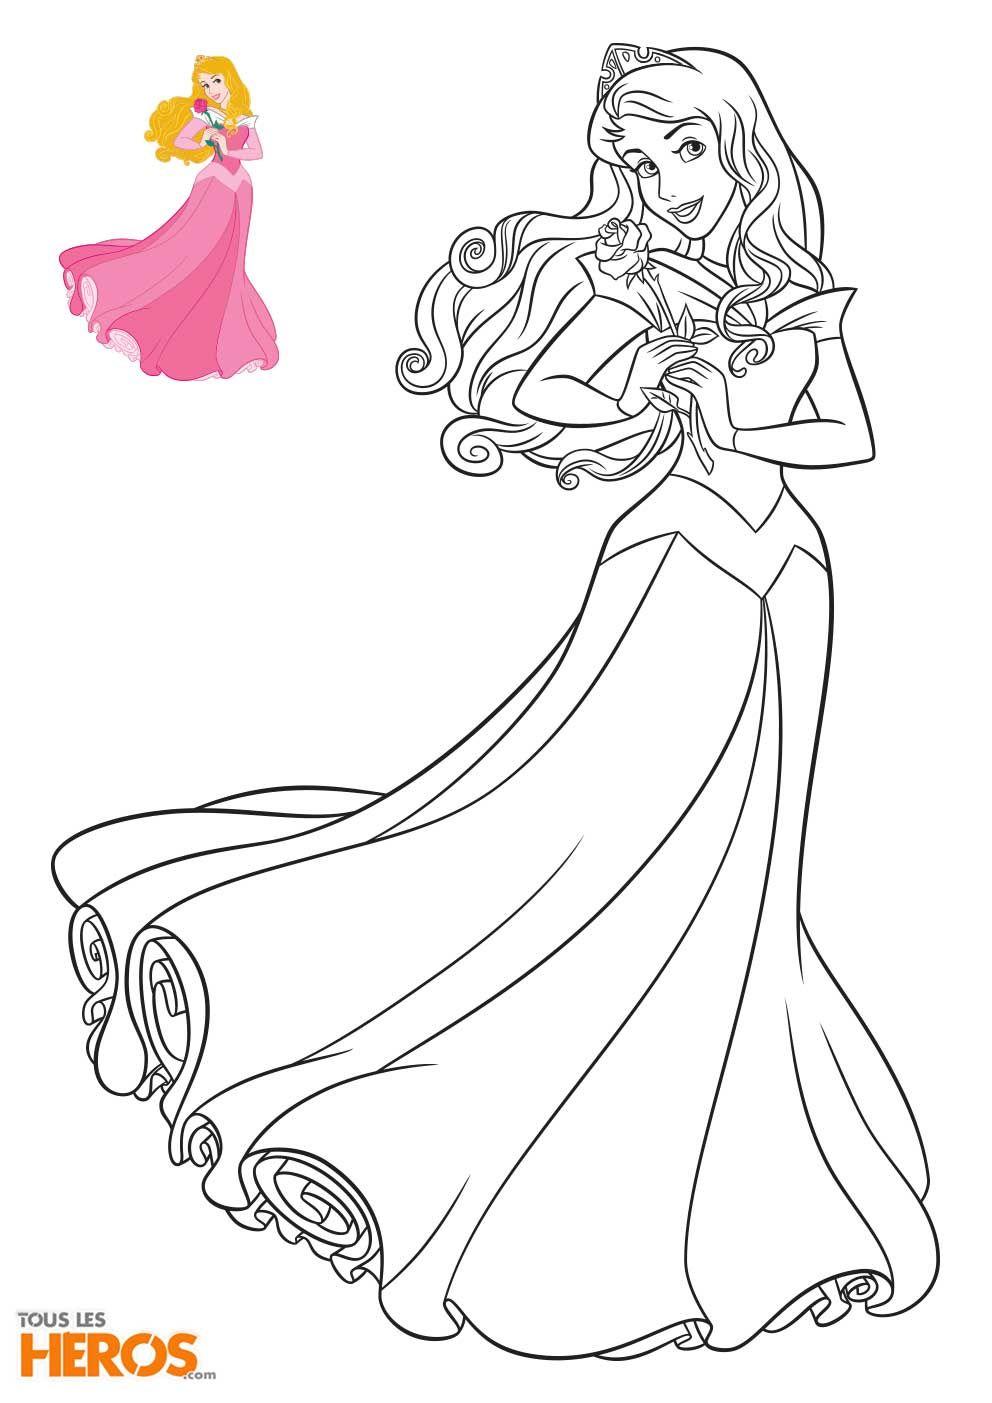 21 Incroyable Coloriage Princesse Disney Ariel Images  Coloriage